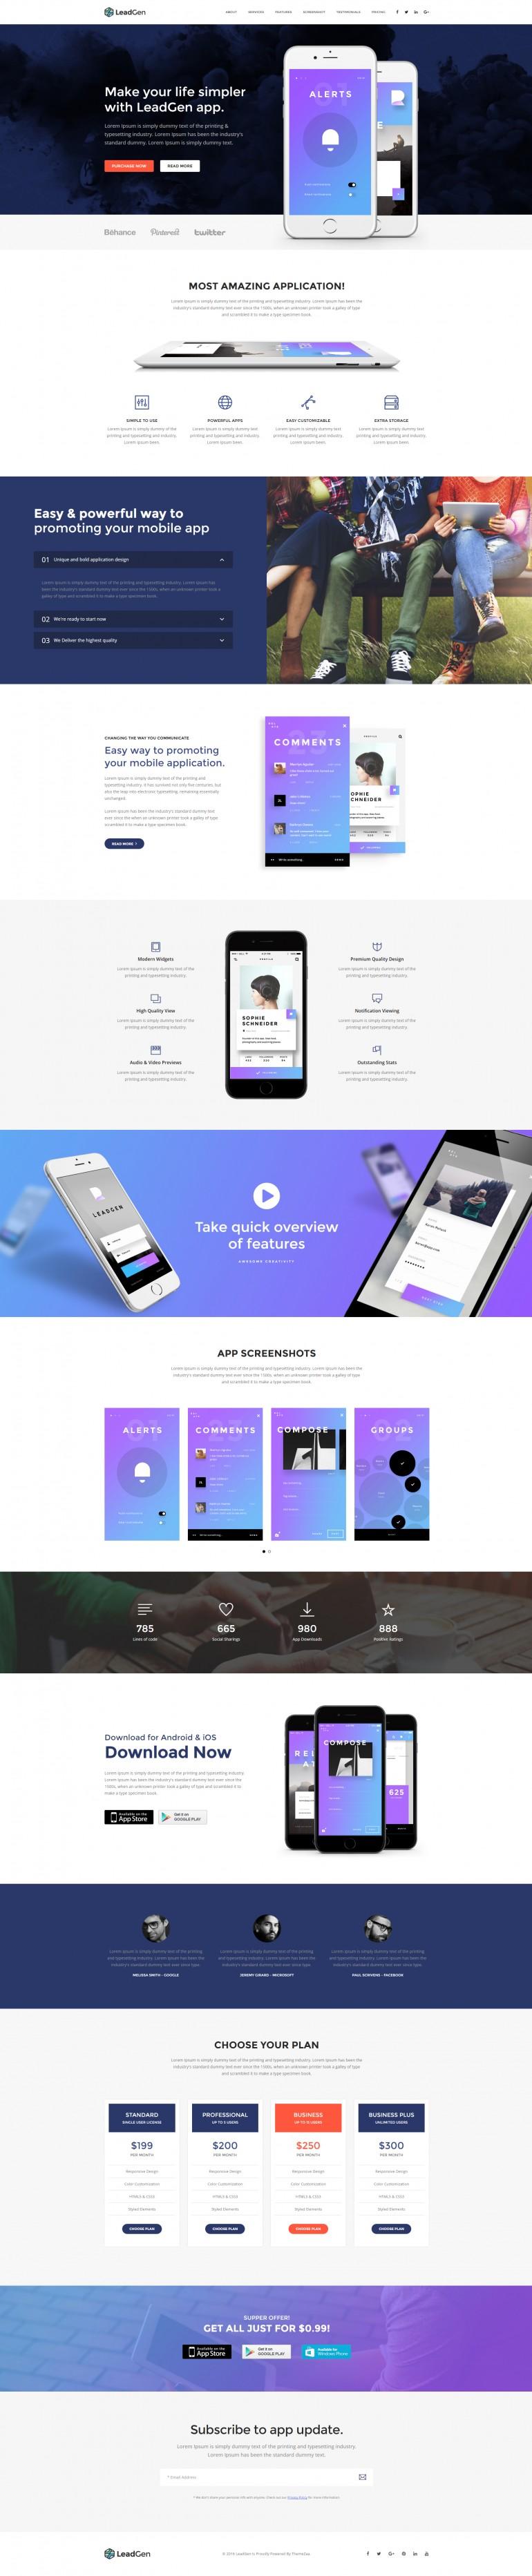 LeadGen – Multipurpose Marketing Landing Page – Application Launching